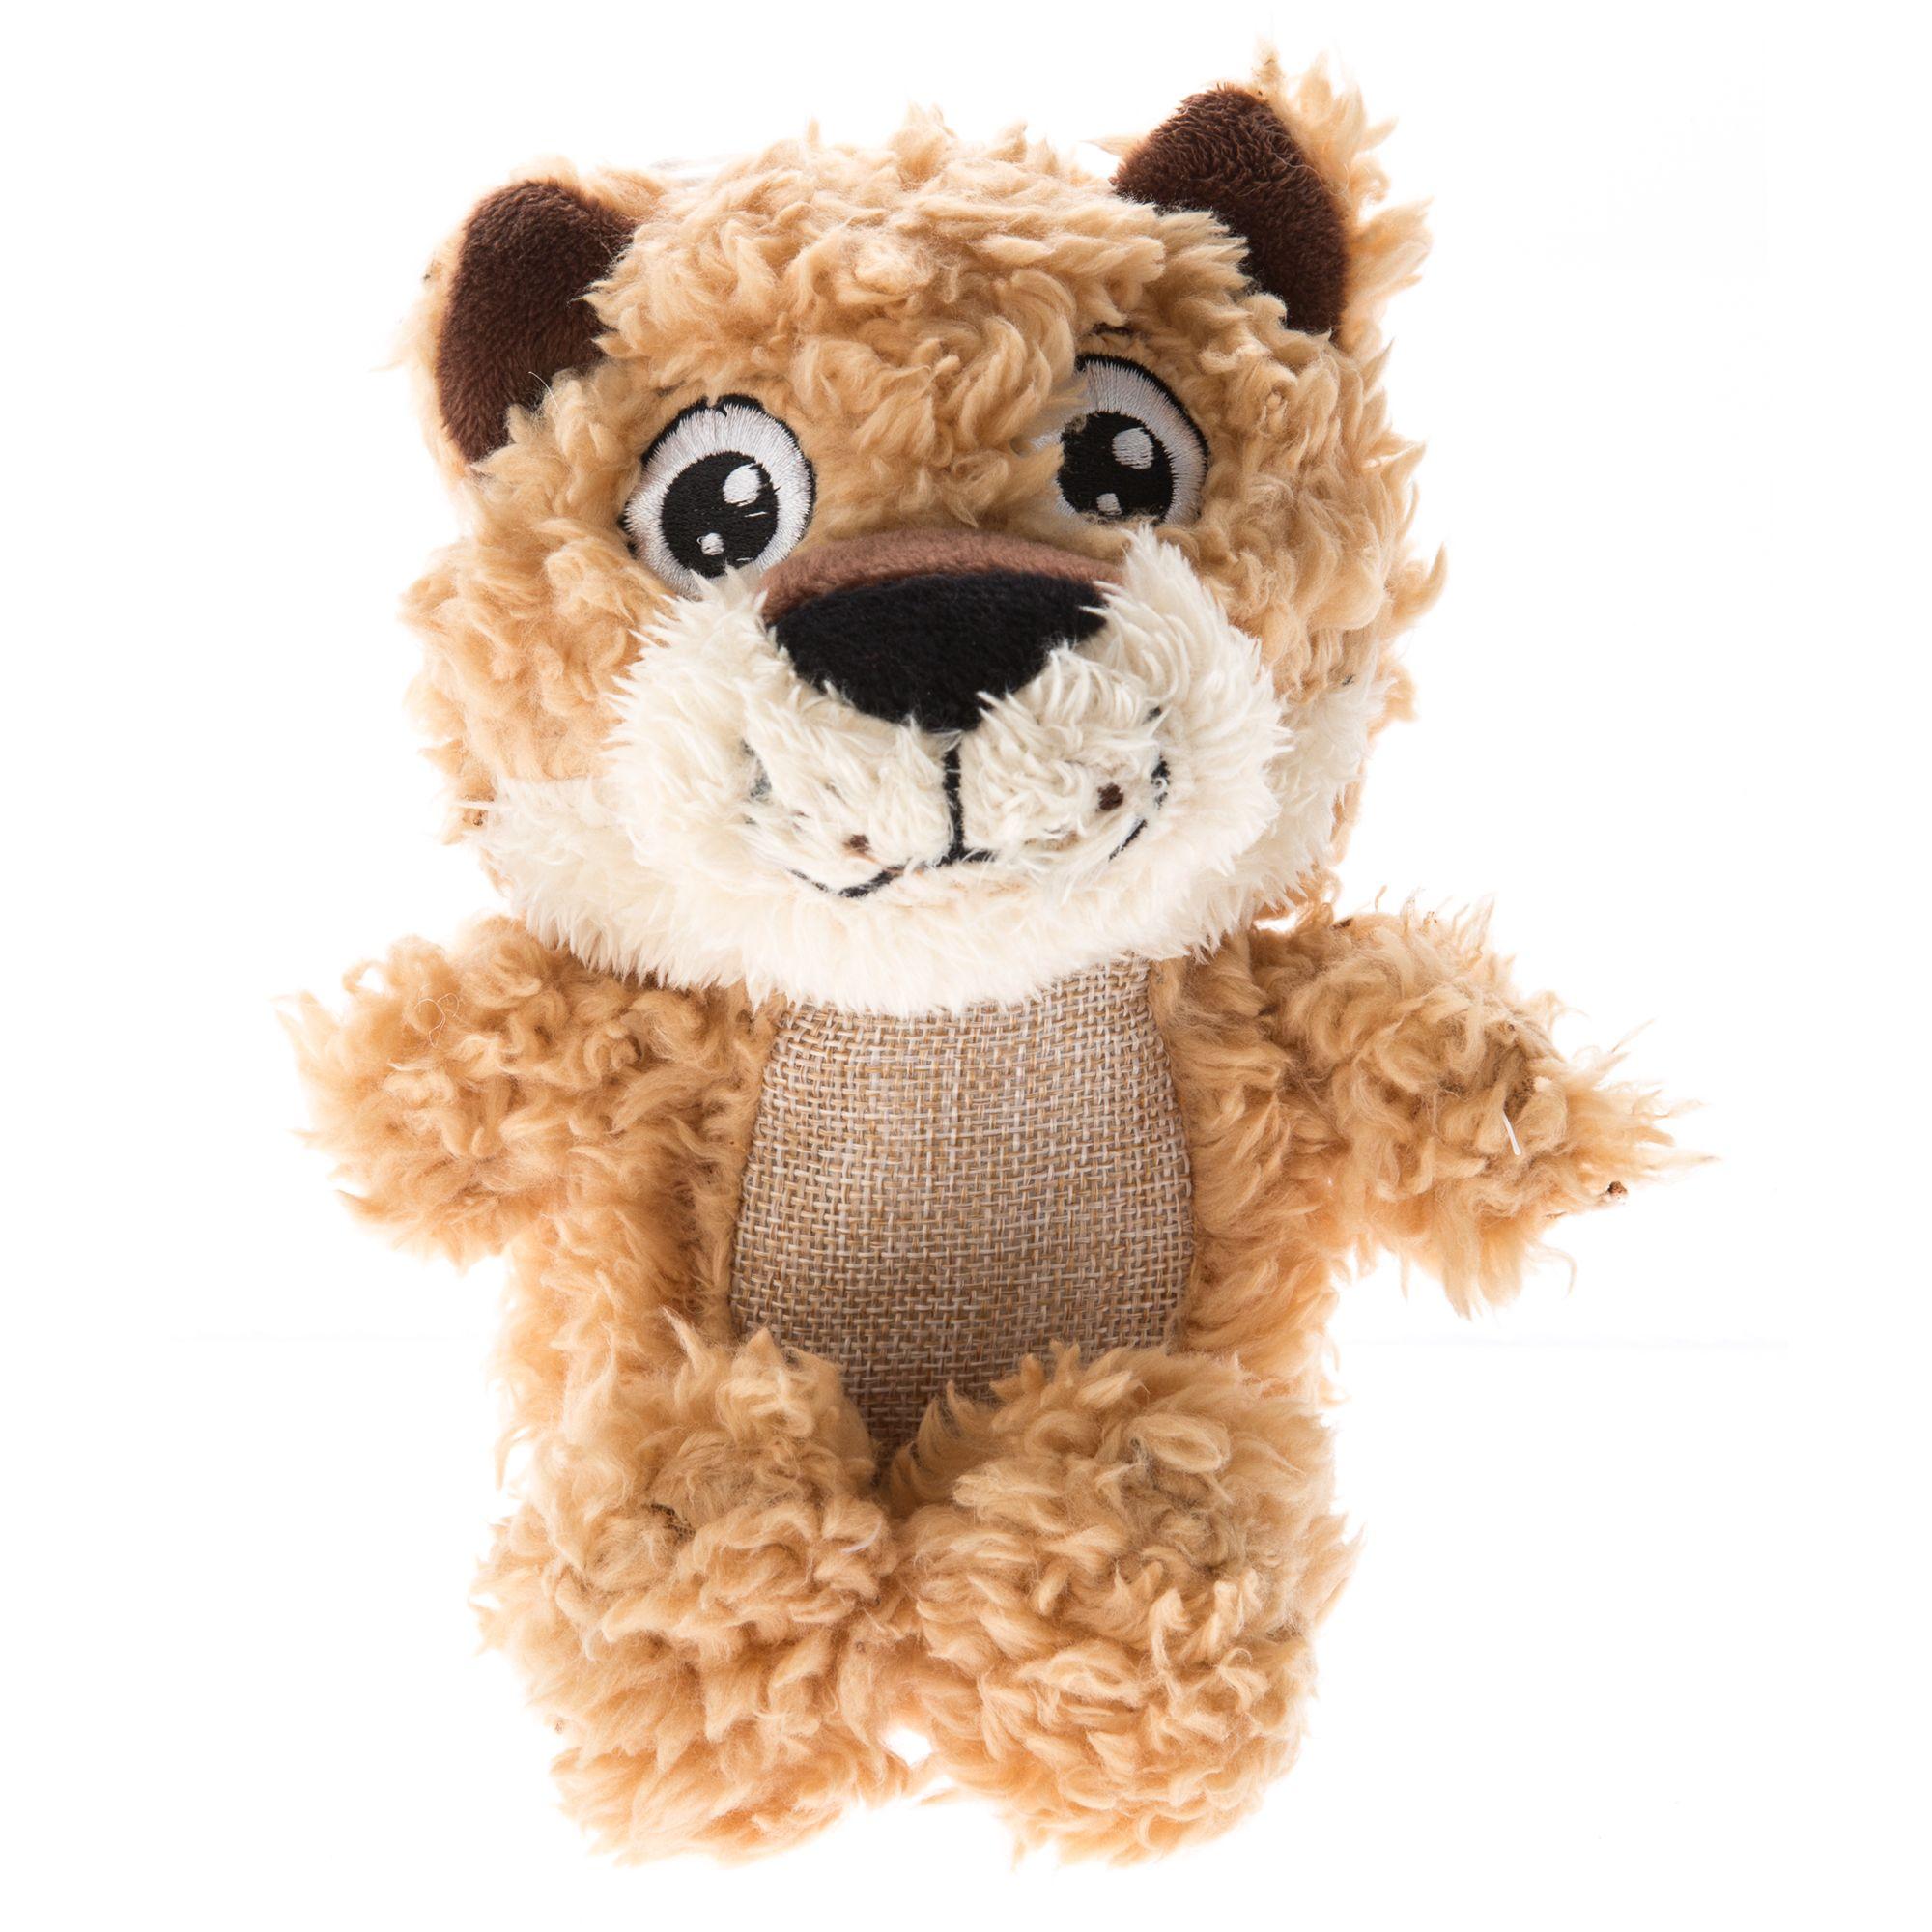 Top Paw® Plush Sherpa Mountain Lion Dog Toy 5253186